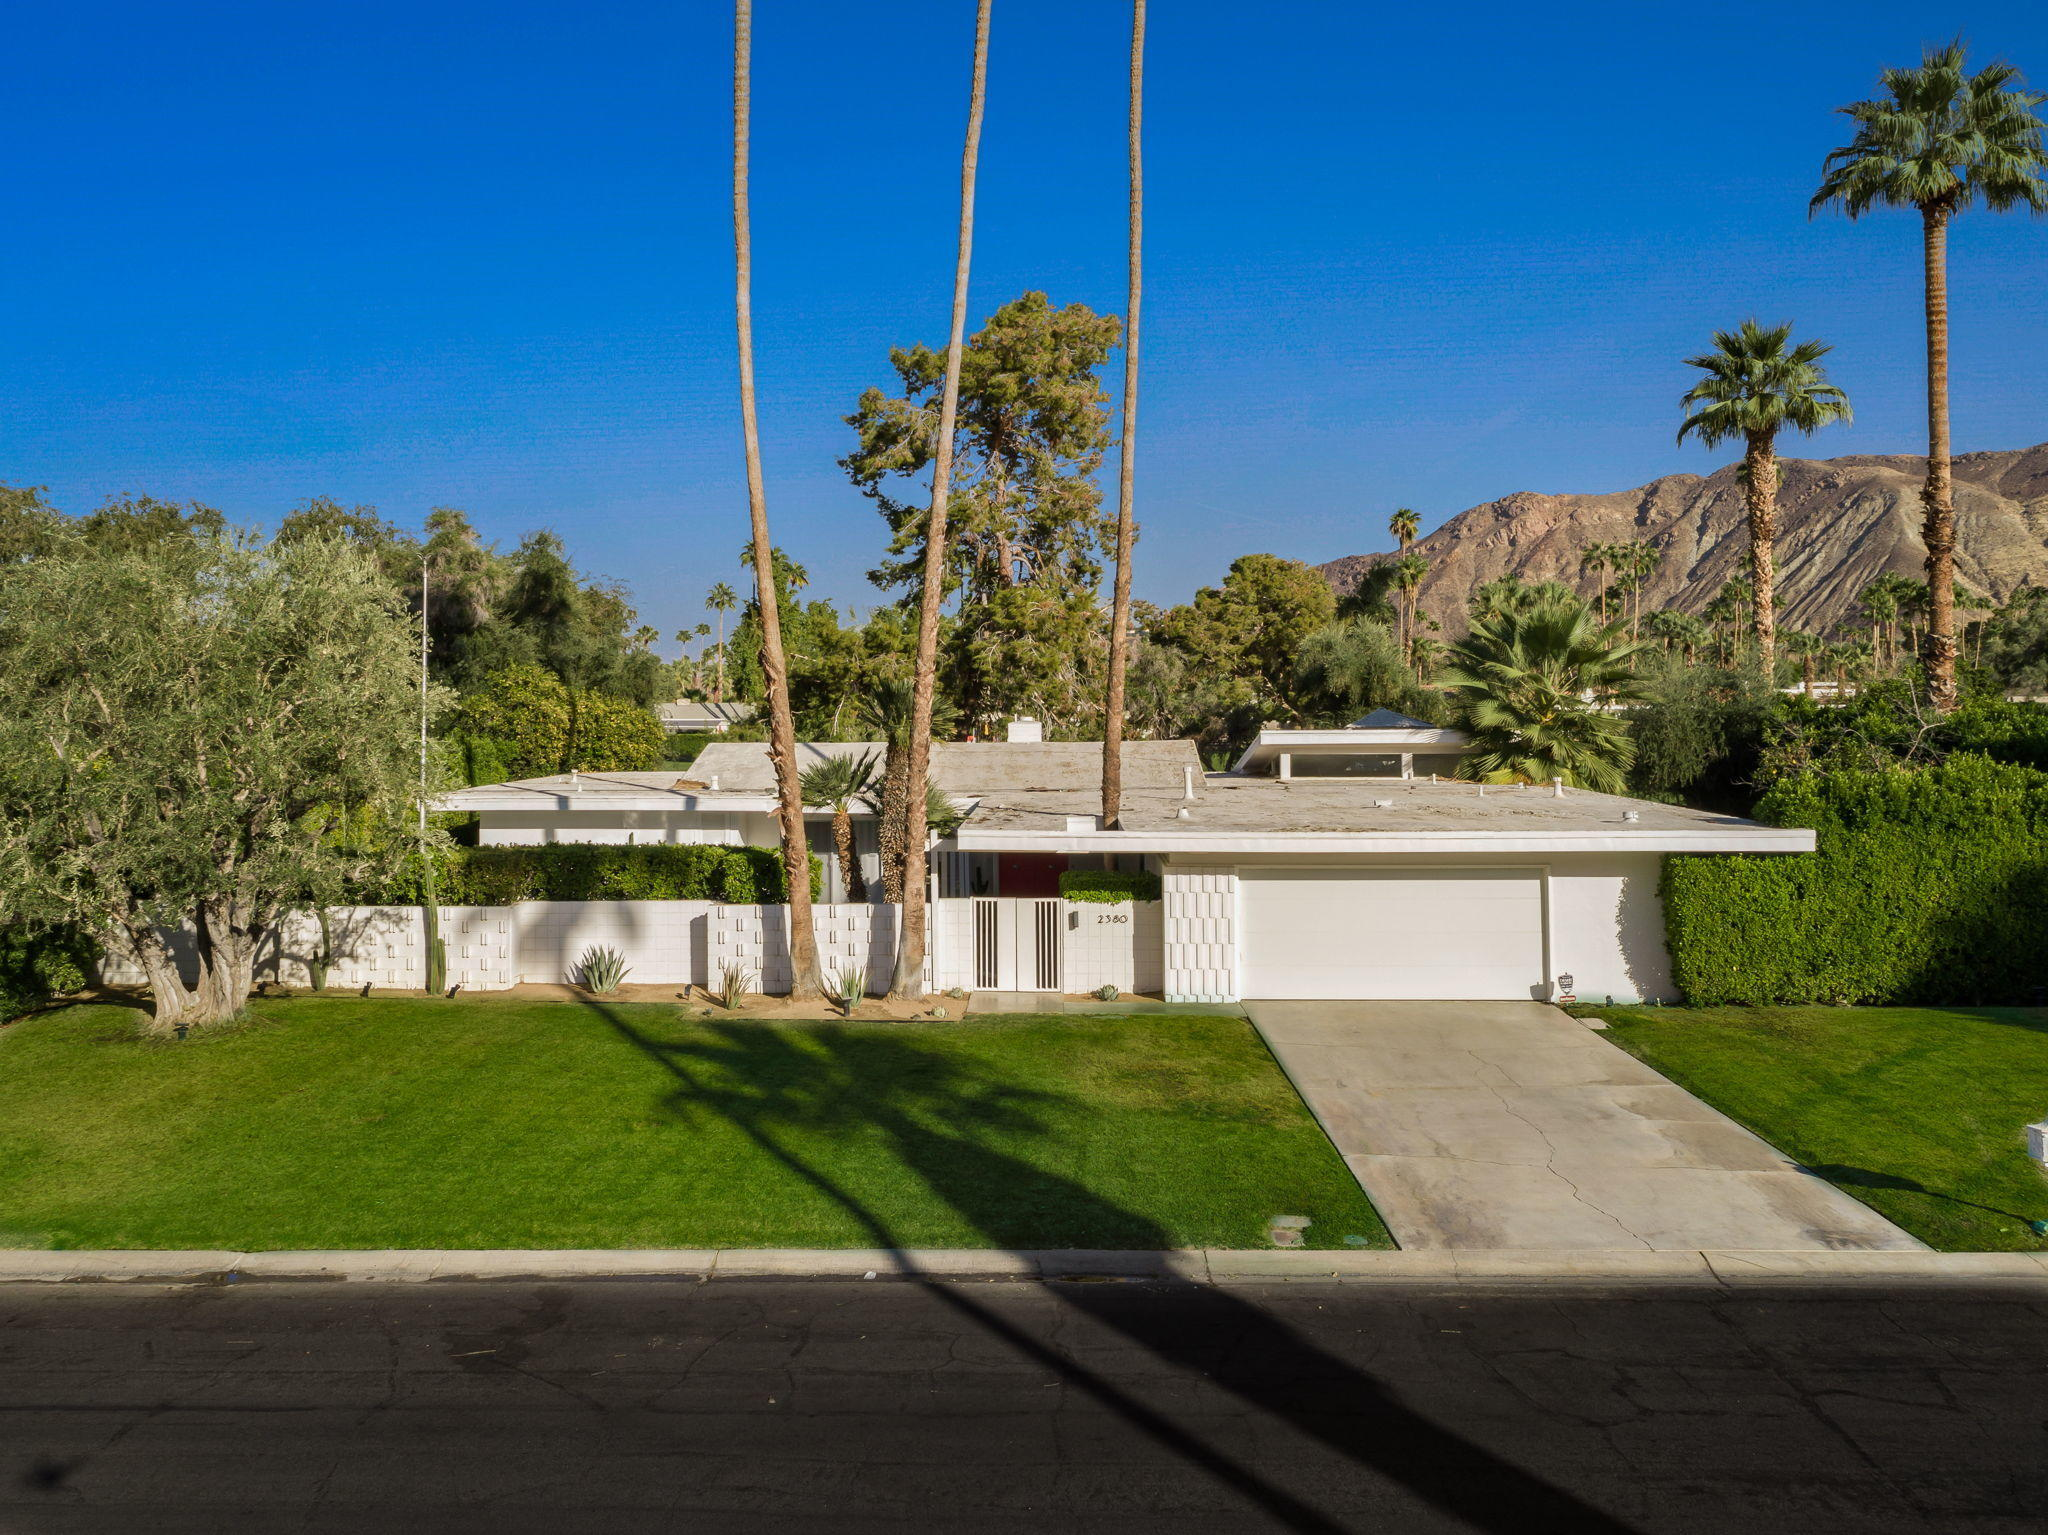 Photo of 2380 S Calle Palo Fierro, Palm Springs, CA 92264